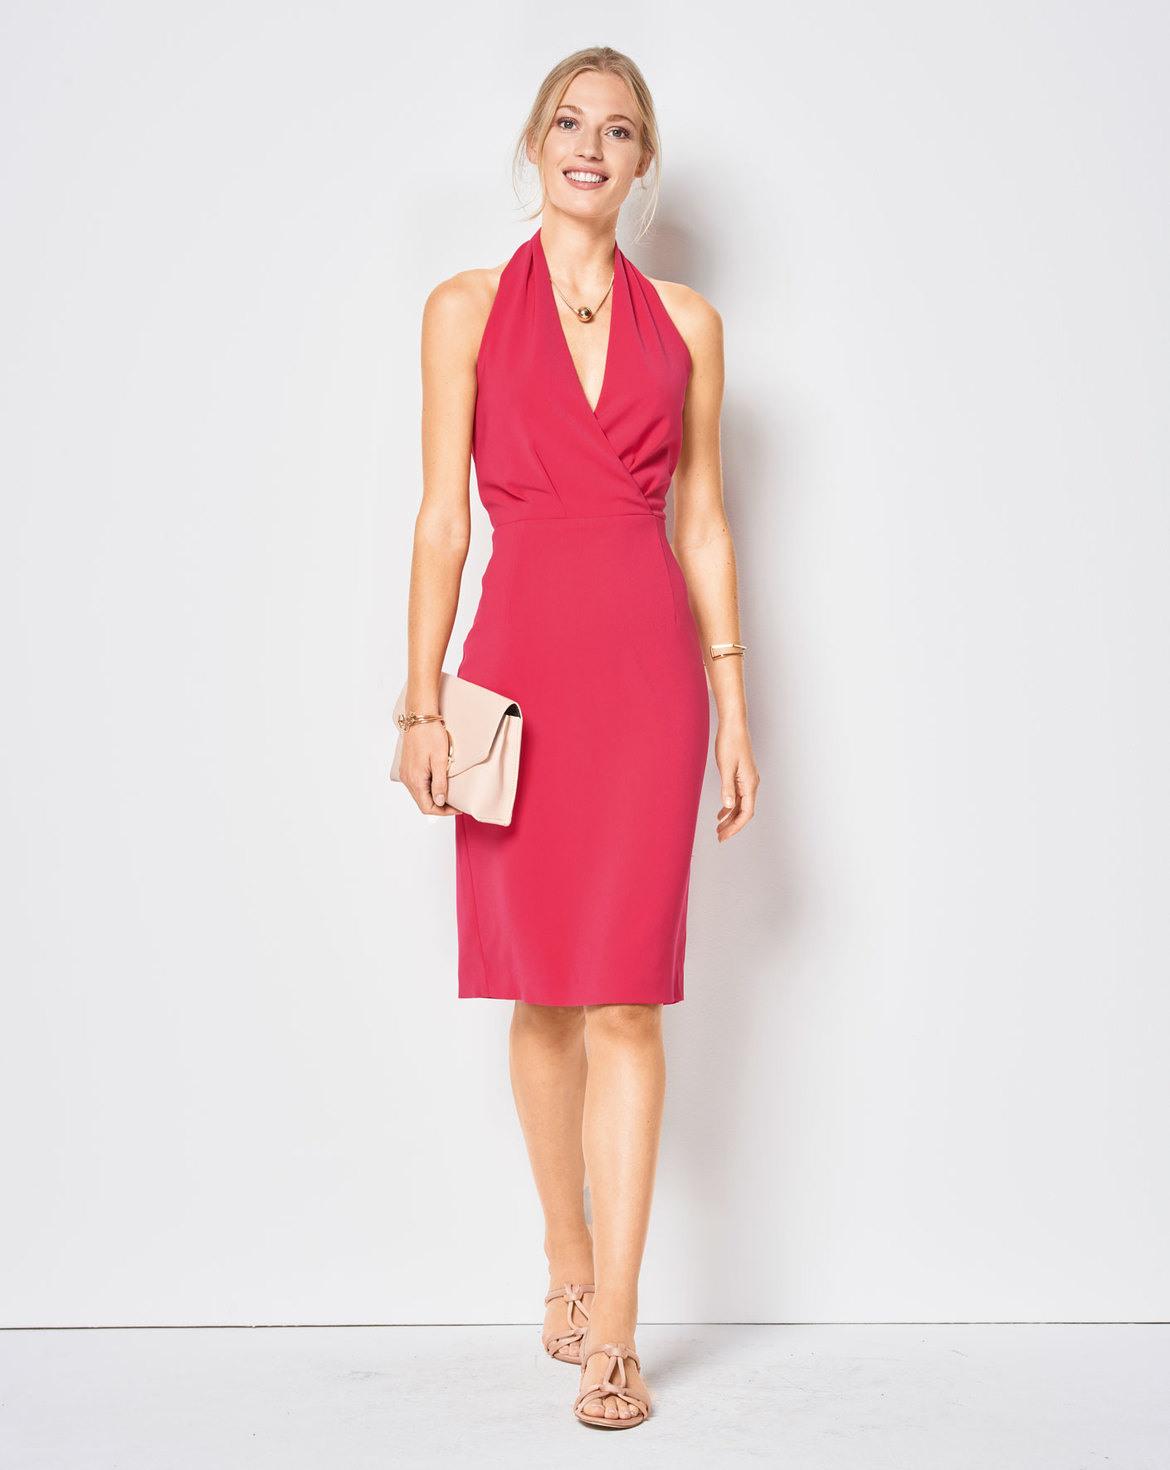 Designer Perfekt Neckholder Kleid GalerieFormal Wunderbar Neckholder Kleid Galerie